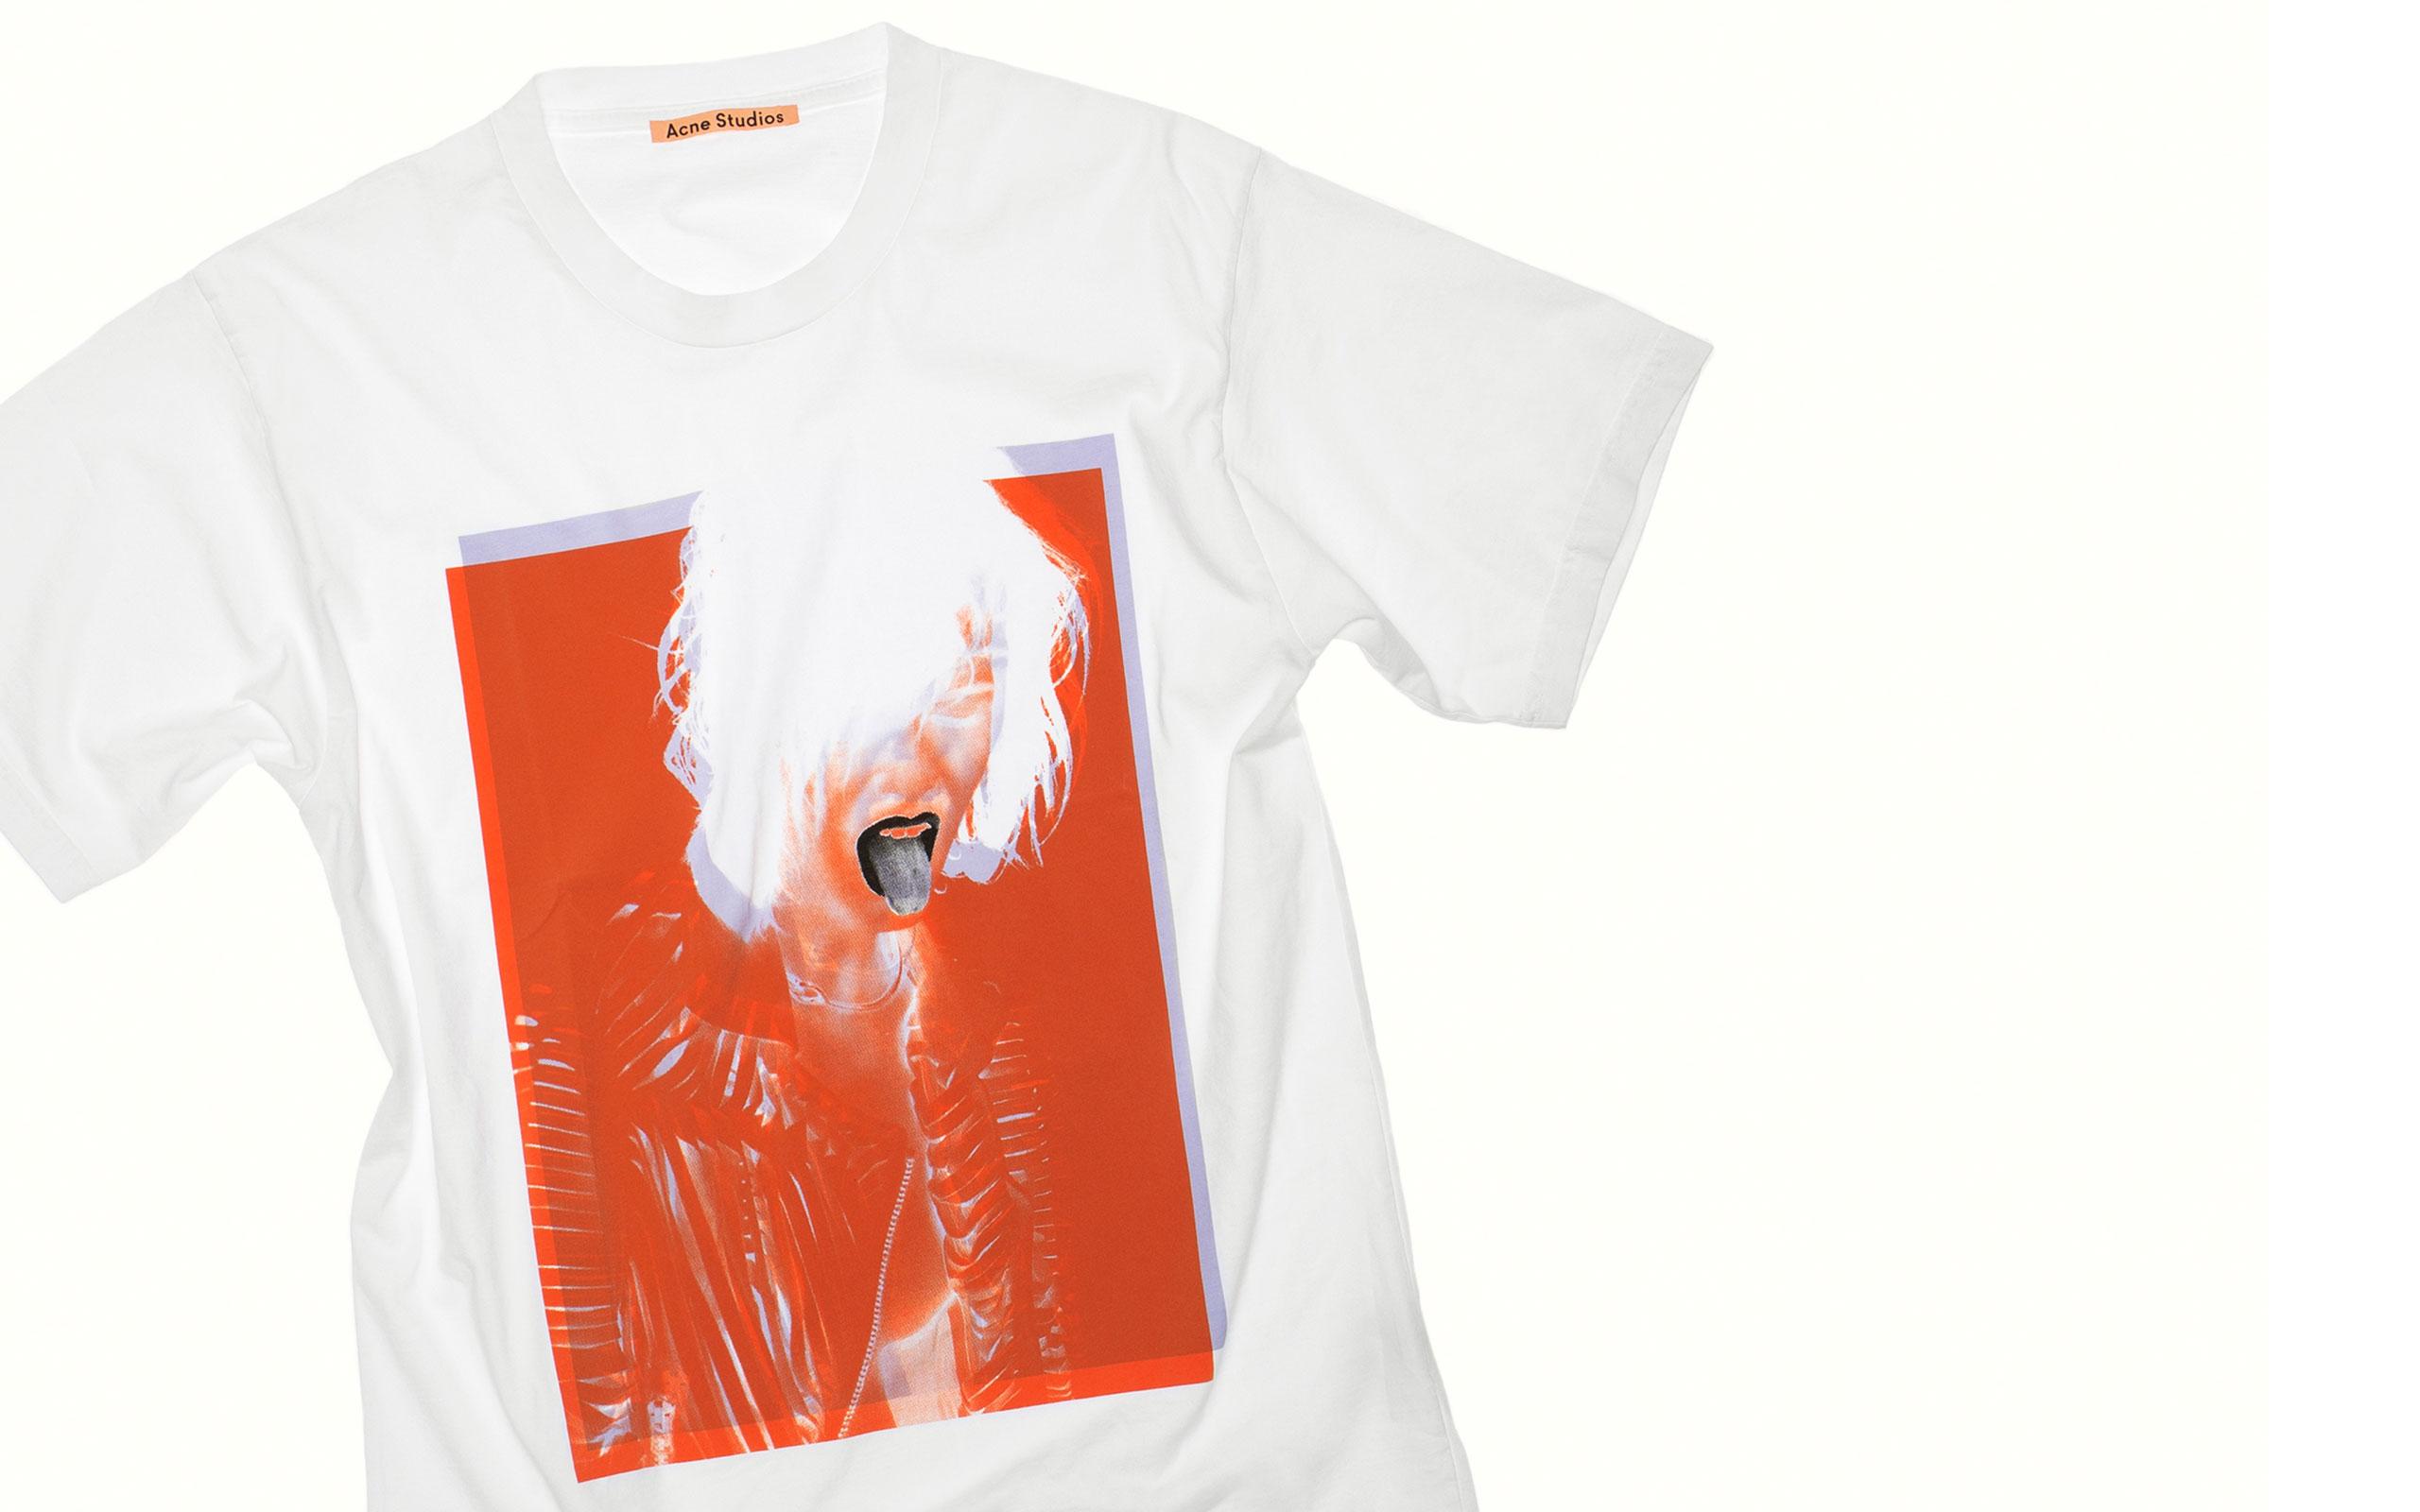 Acne Studios Releases New Capsule Collection Featuring Viviane Sassen